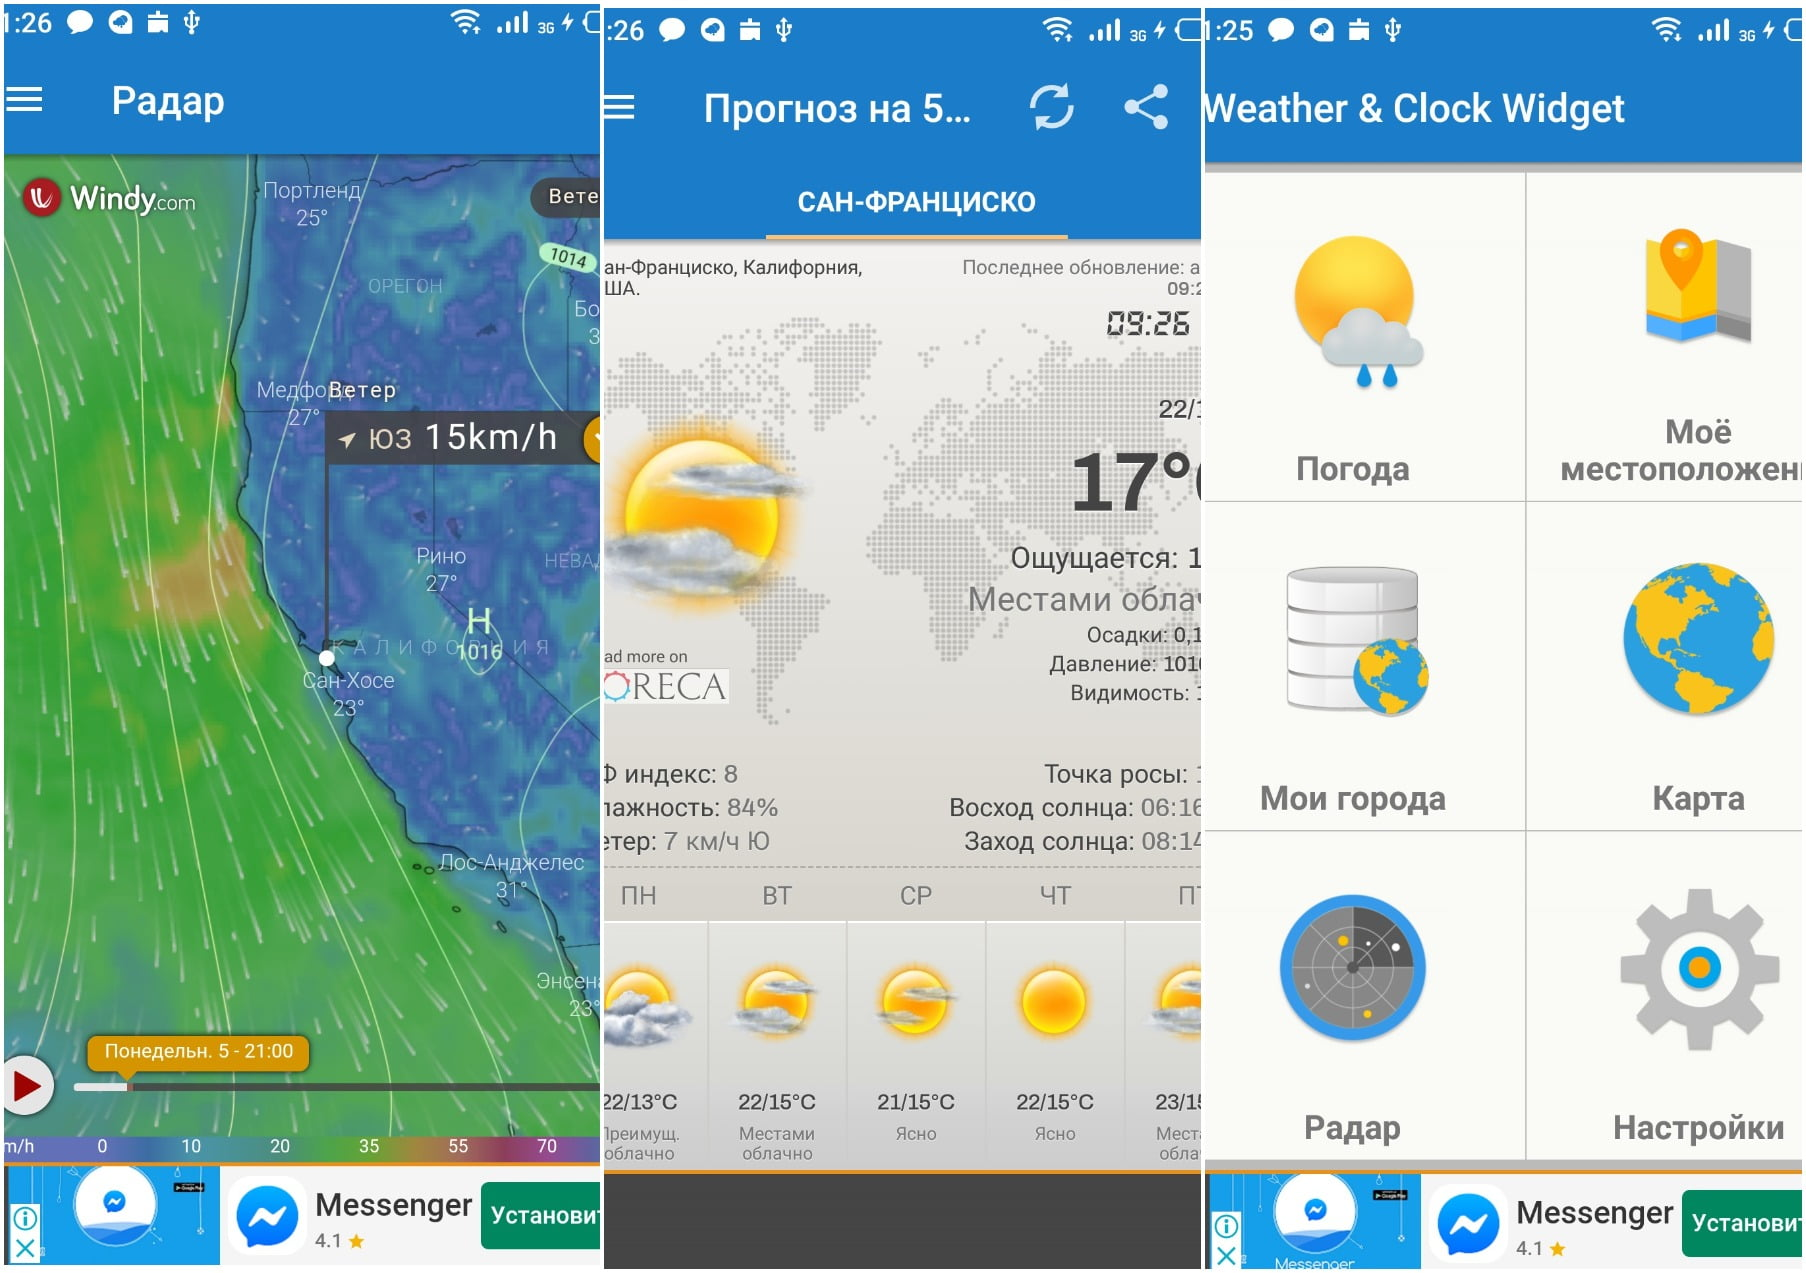 На фото изображено приложение Android weather clock widget